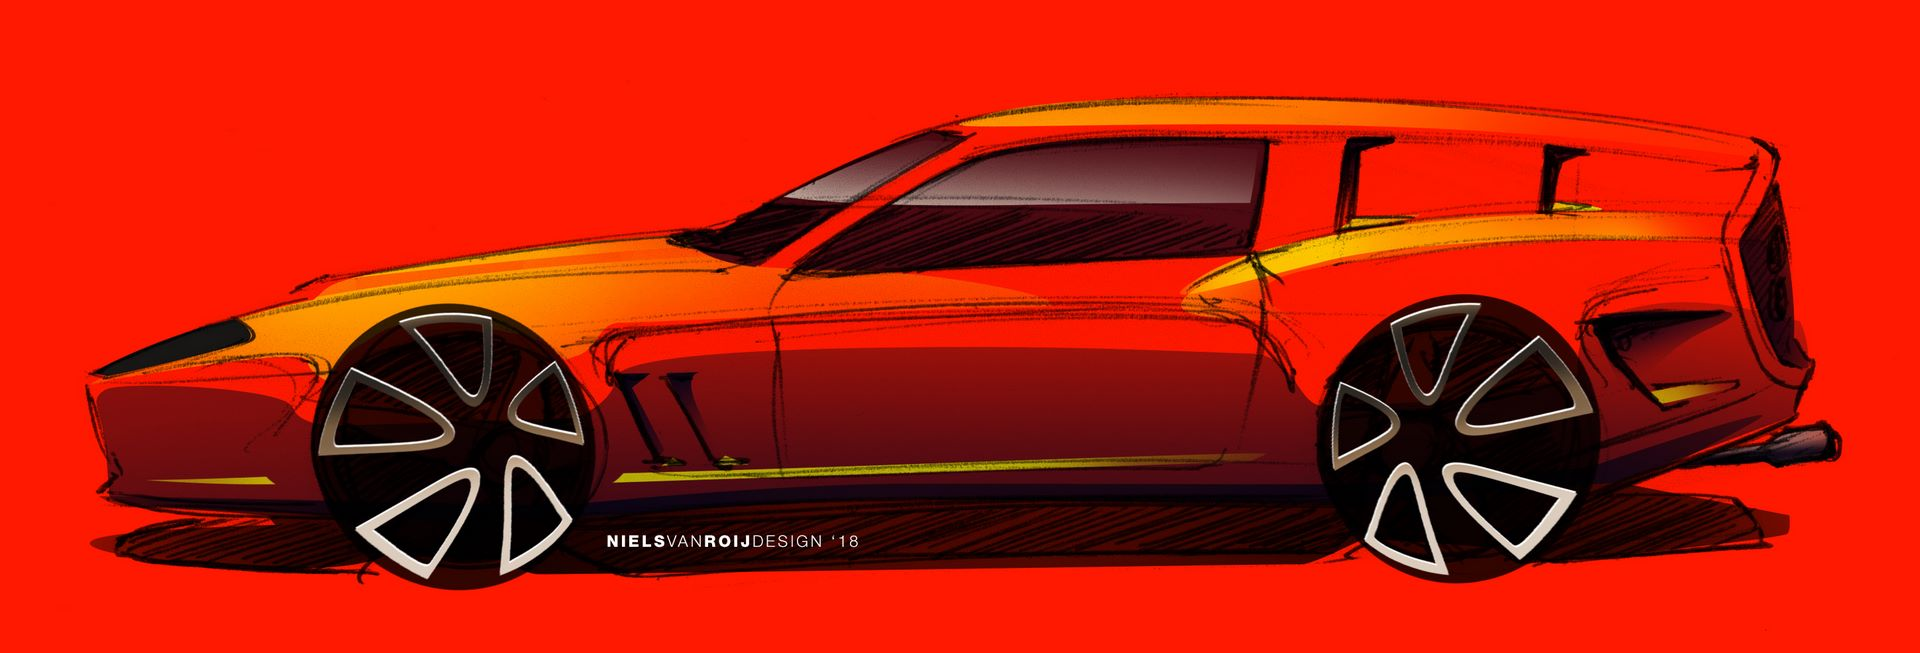 Ferrari-Breadvan-Hommage-49